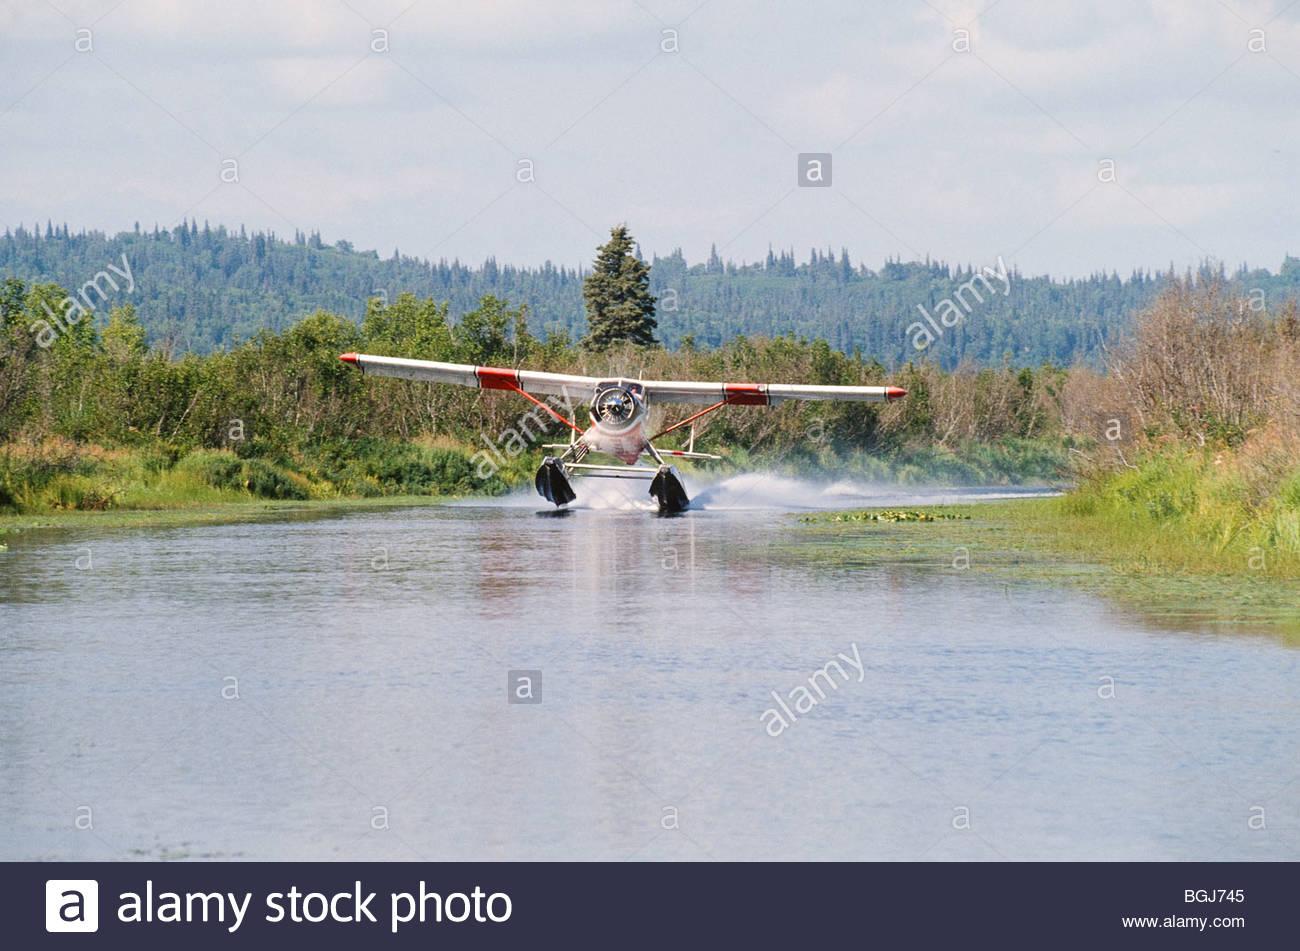 Alaska. Float Planes link rural communities in all of Alaska. - Stock Image